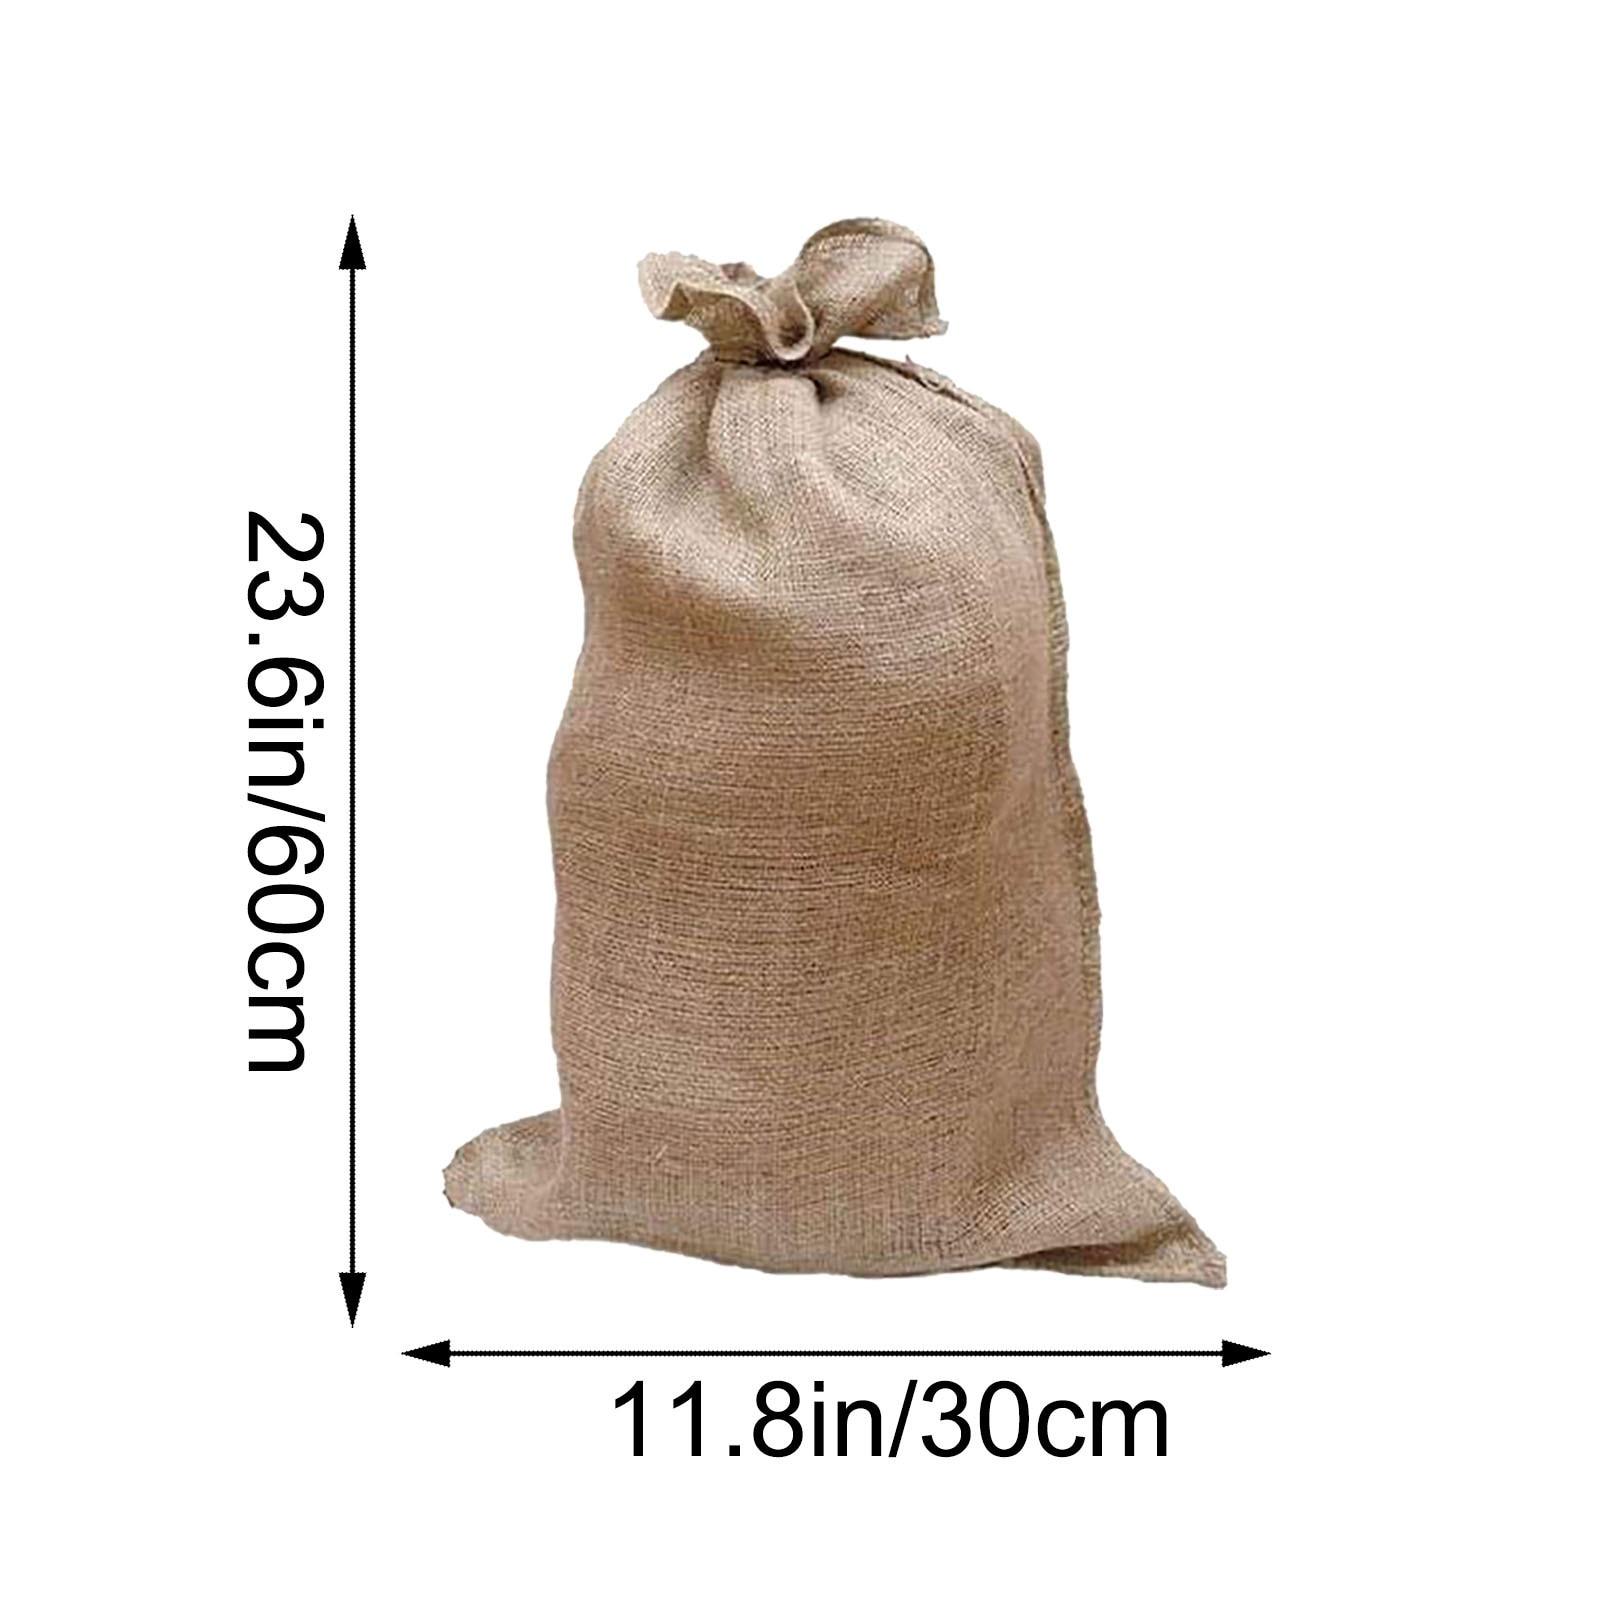 lou cameron stringer and the deadly flood Flood-Sandbags Flood-Bag Waterproof And Durable Flood-Protection sandsack high water flood sand bag Flood Woven Expansion Bag